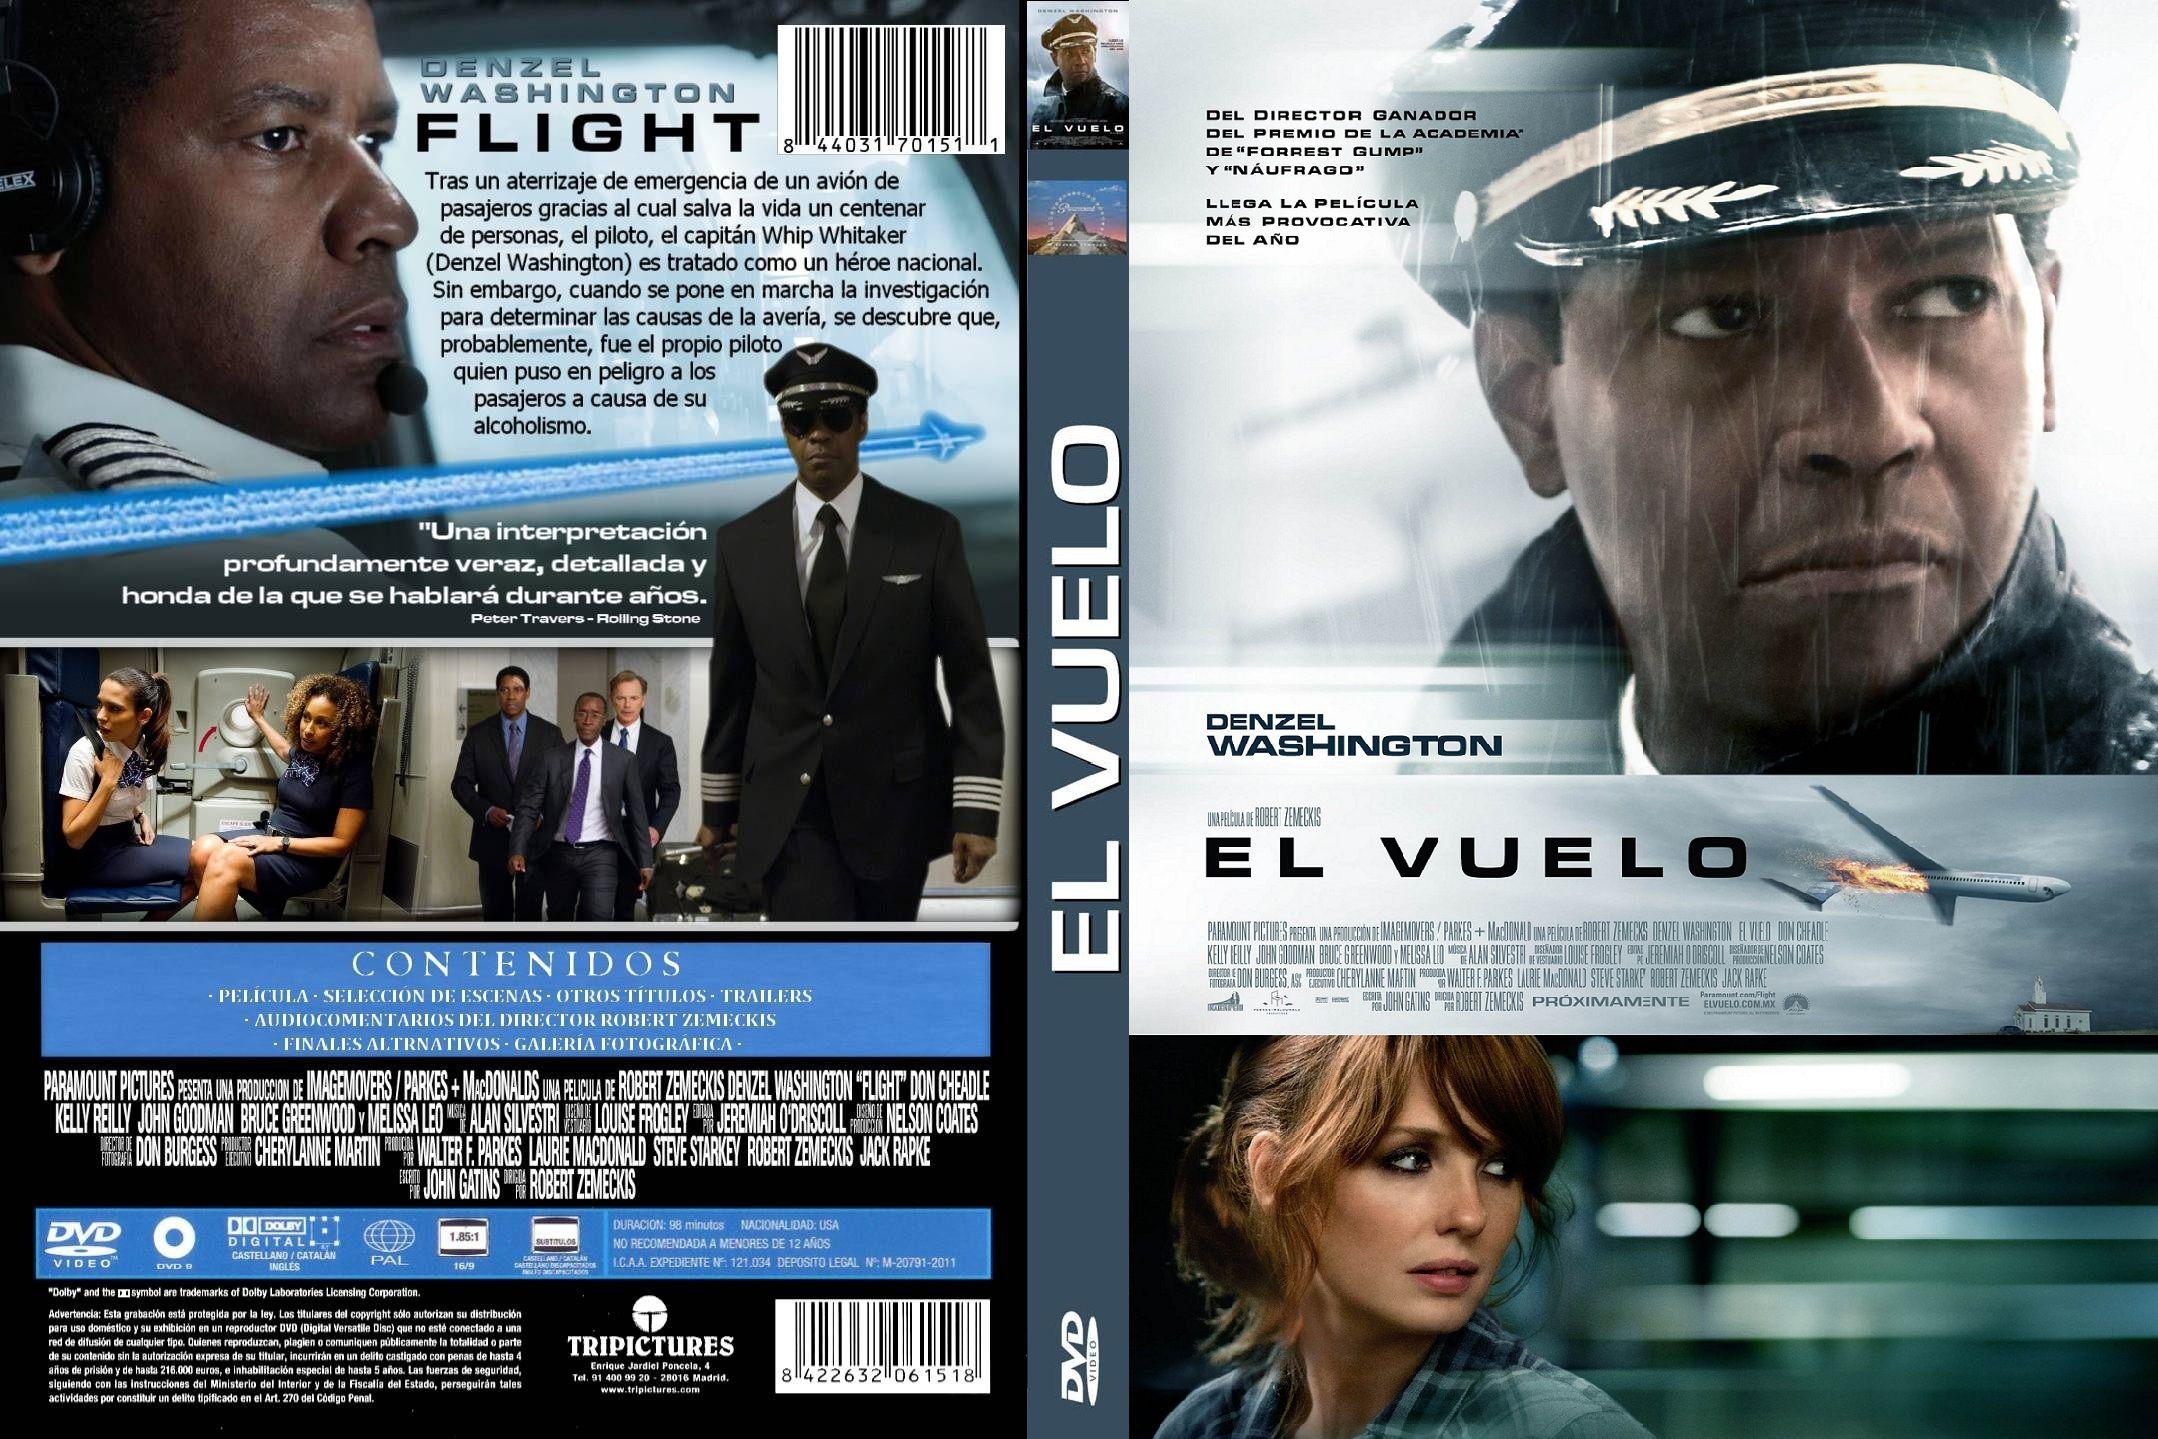 El Vuelo (2012) [Dvdrip Latino] [Zippyshare]